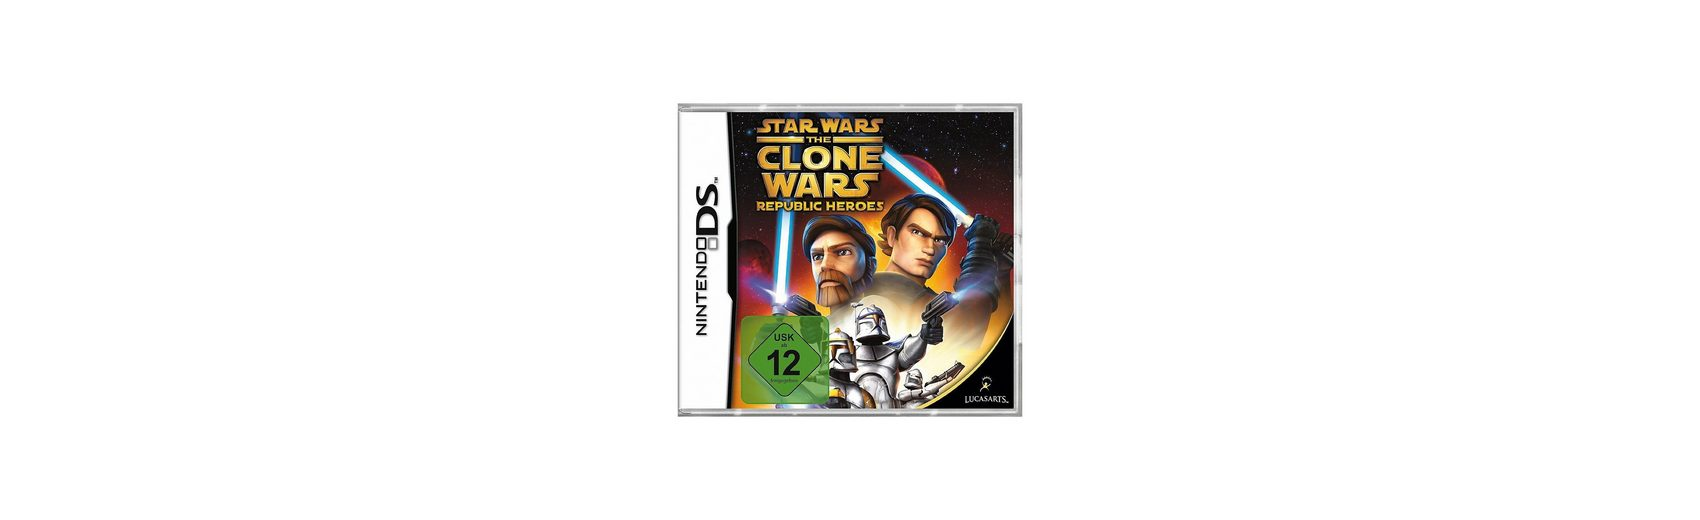 ak tronic NDS The Clone Wars Republic Heroes